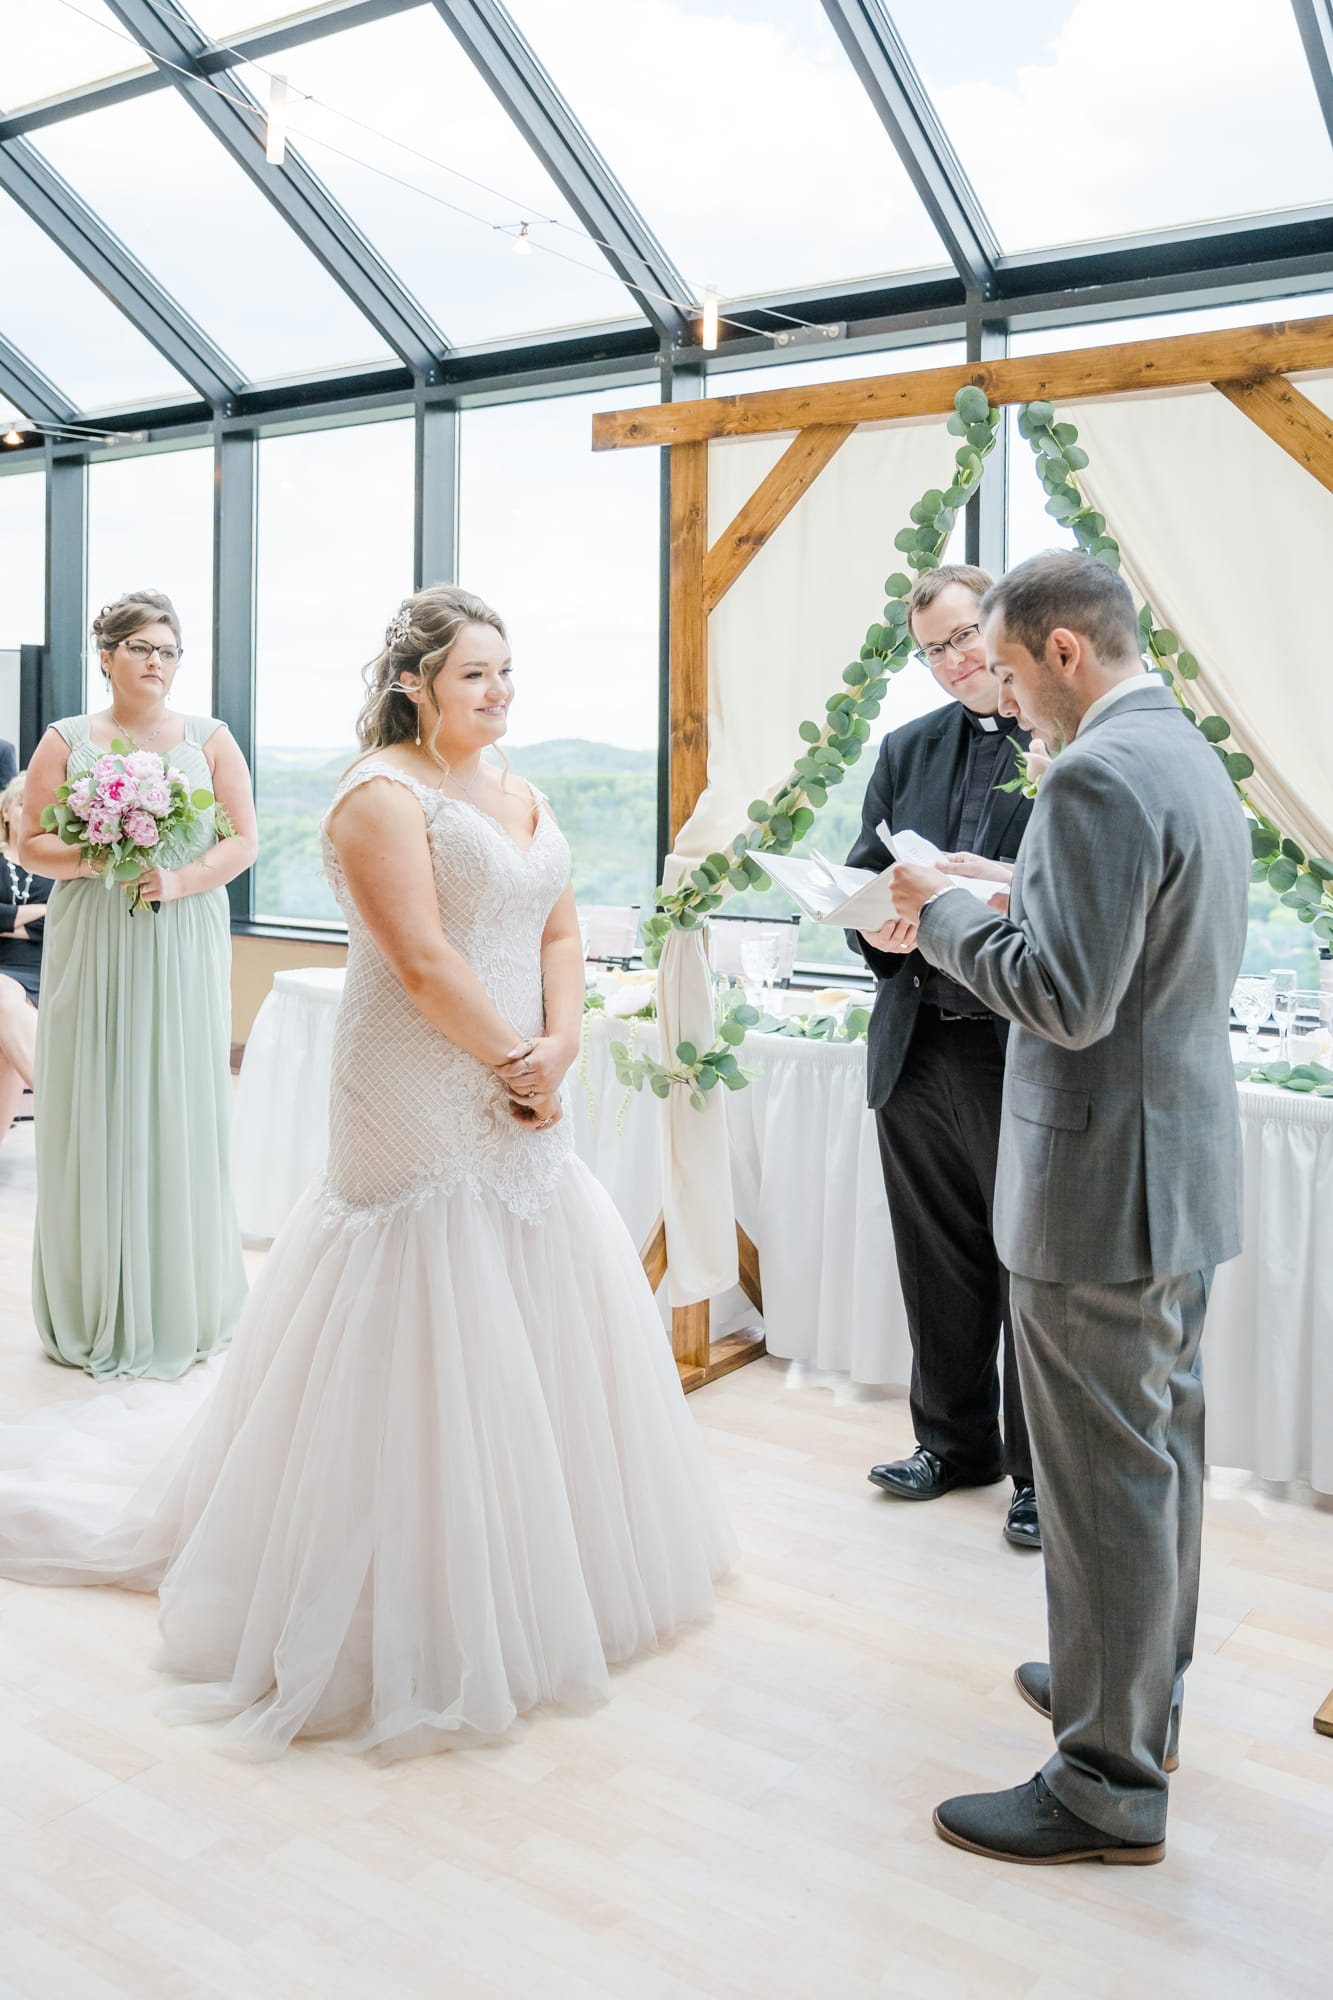 Central Pennsylvania PA summer wedding vows exchange